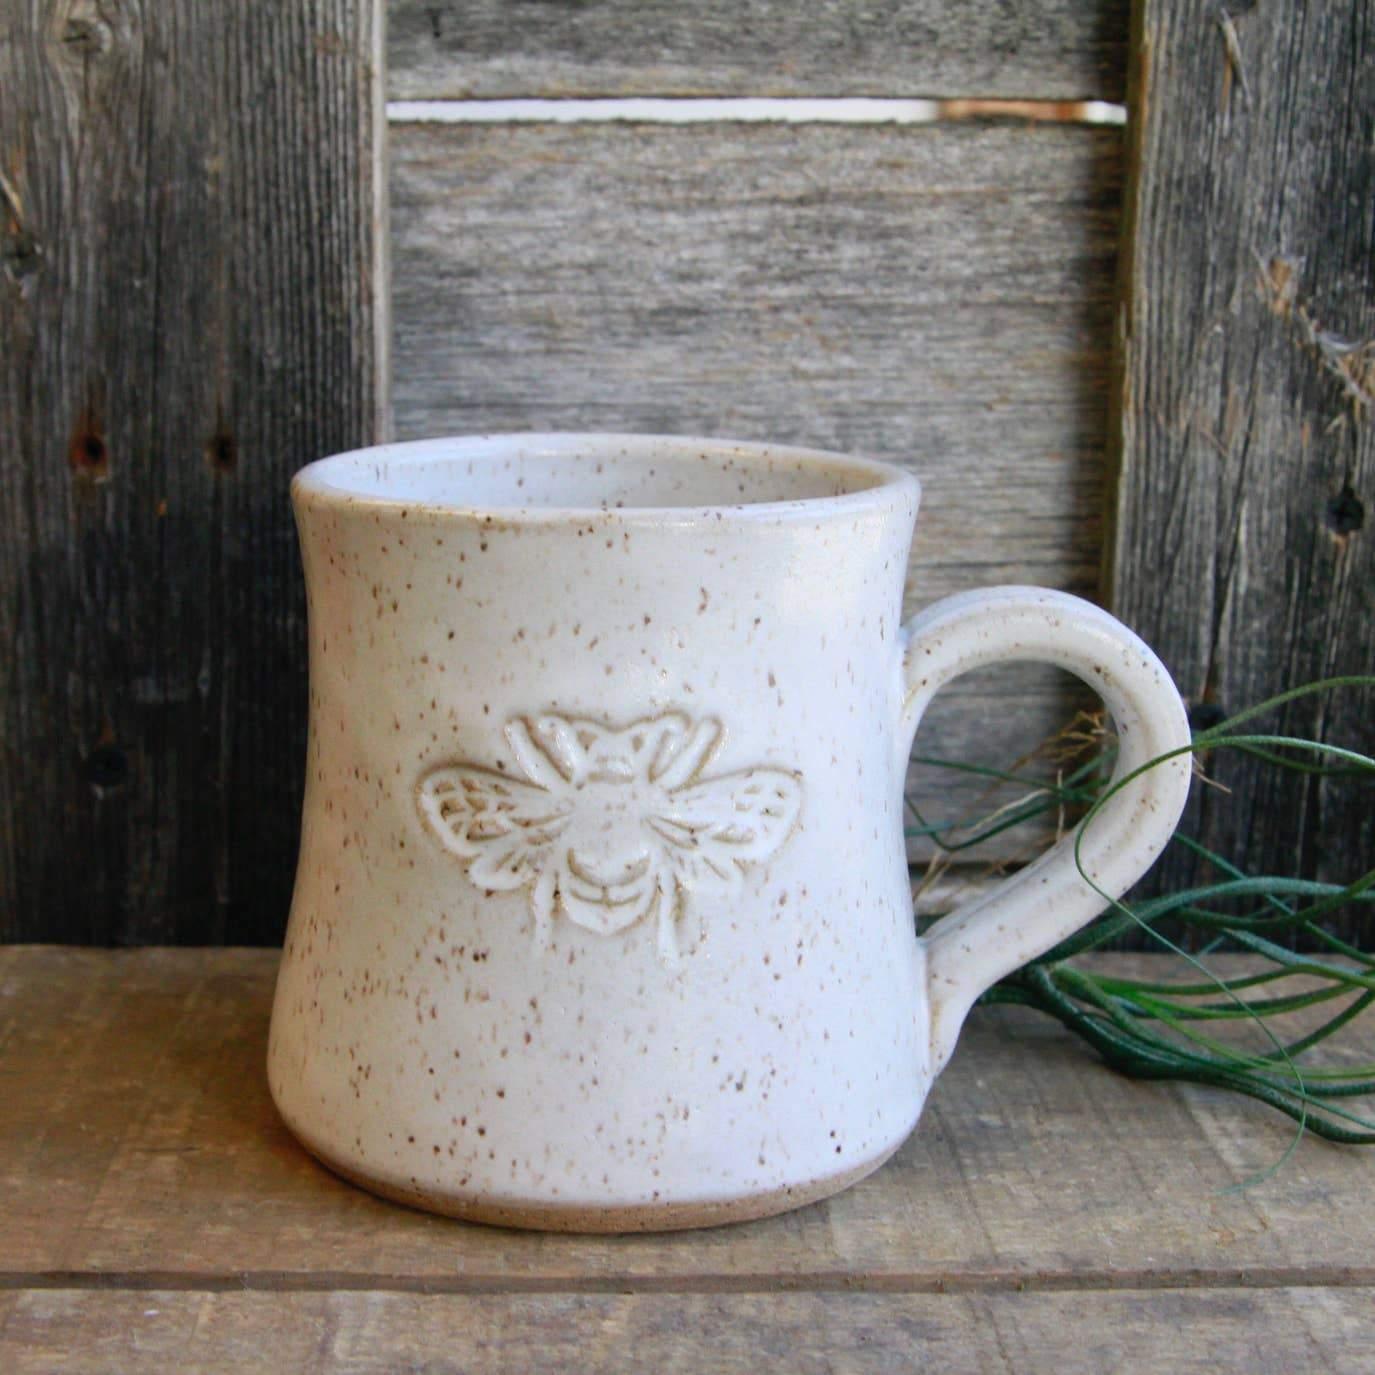 Ceramic mug with bee on it